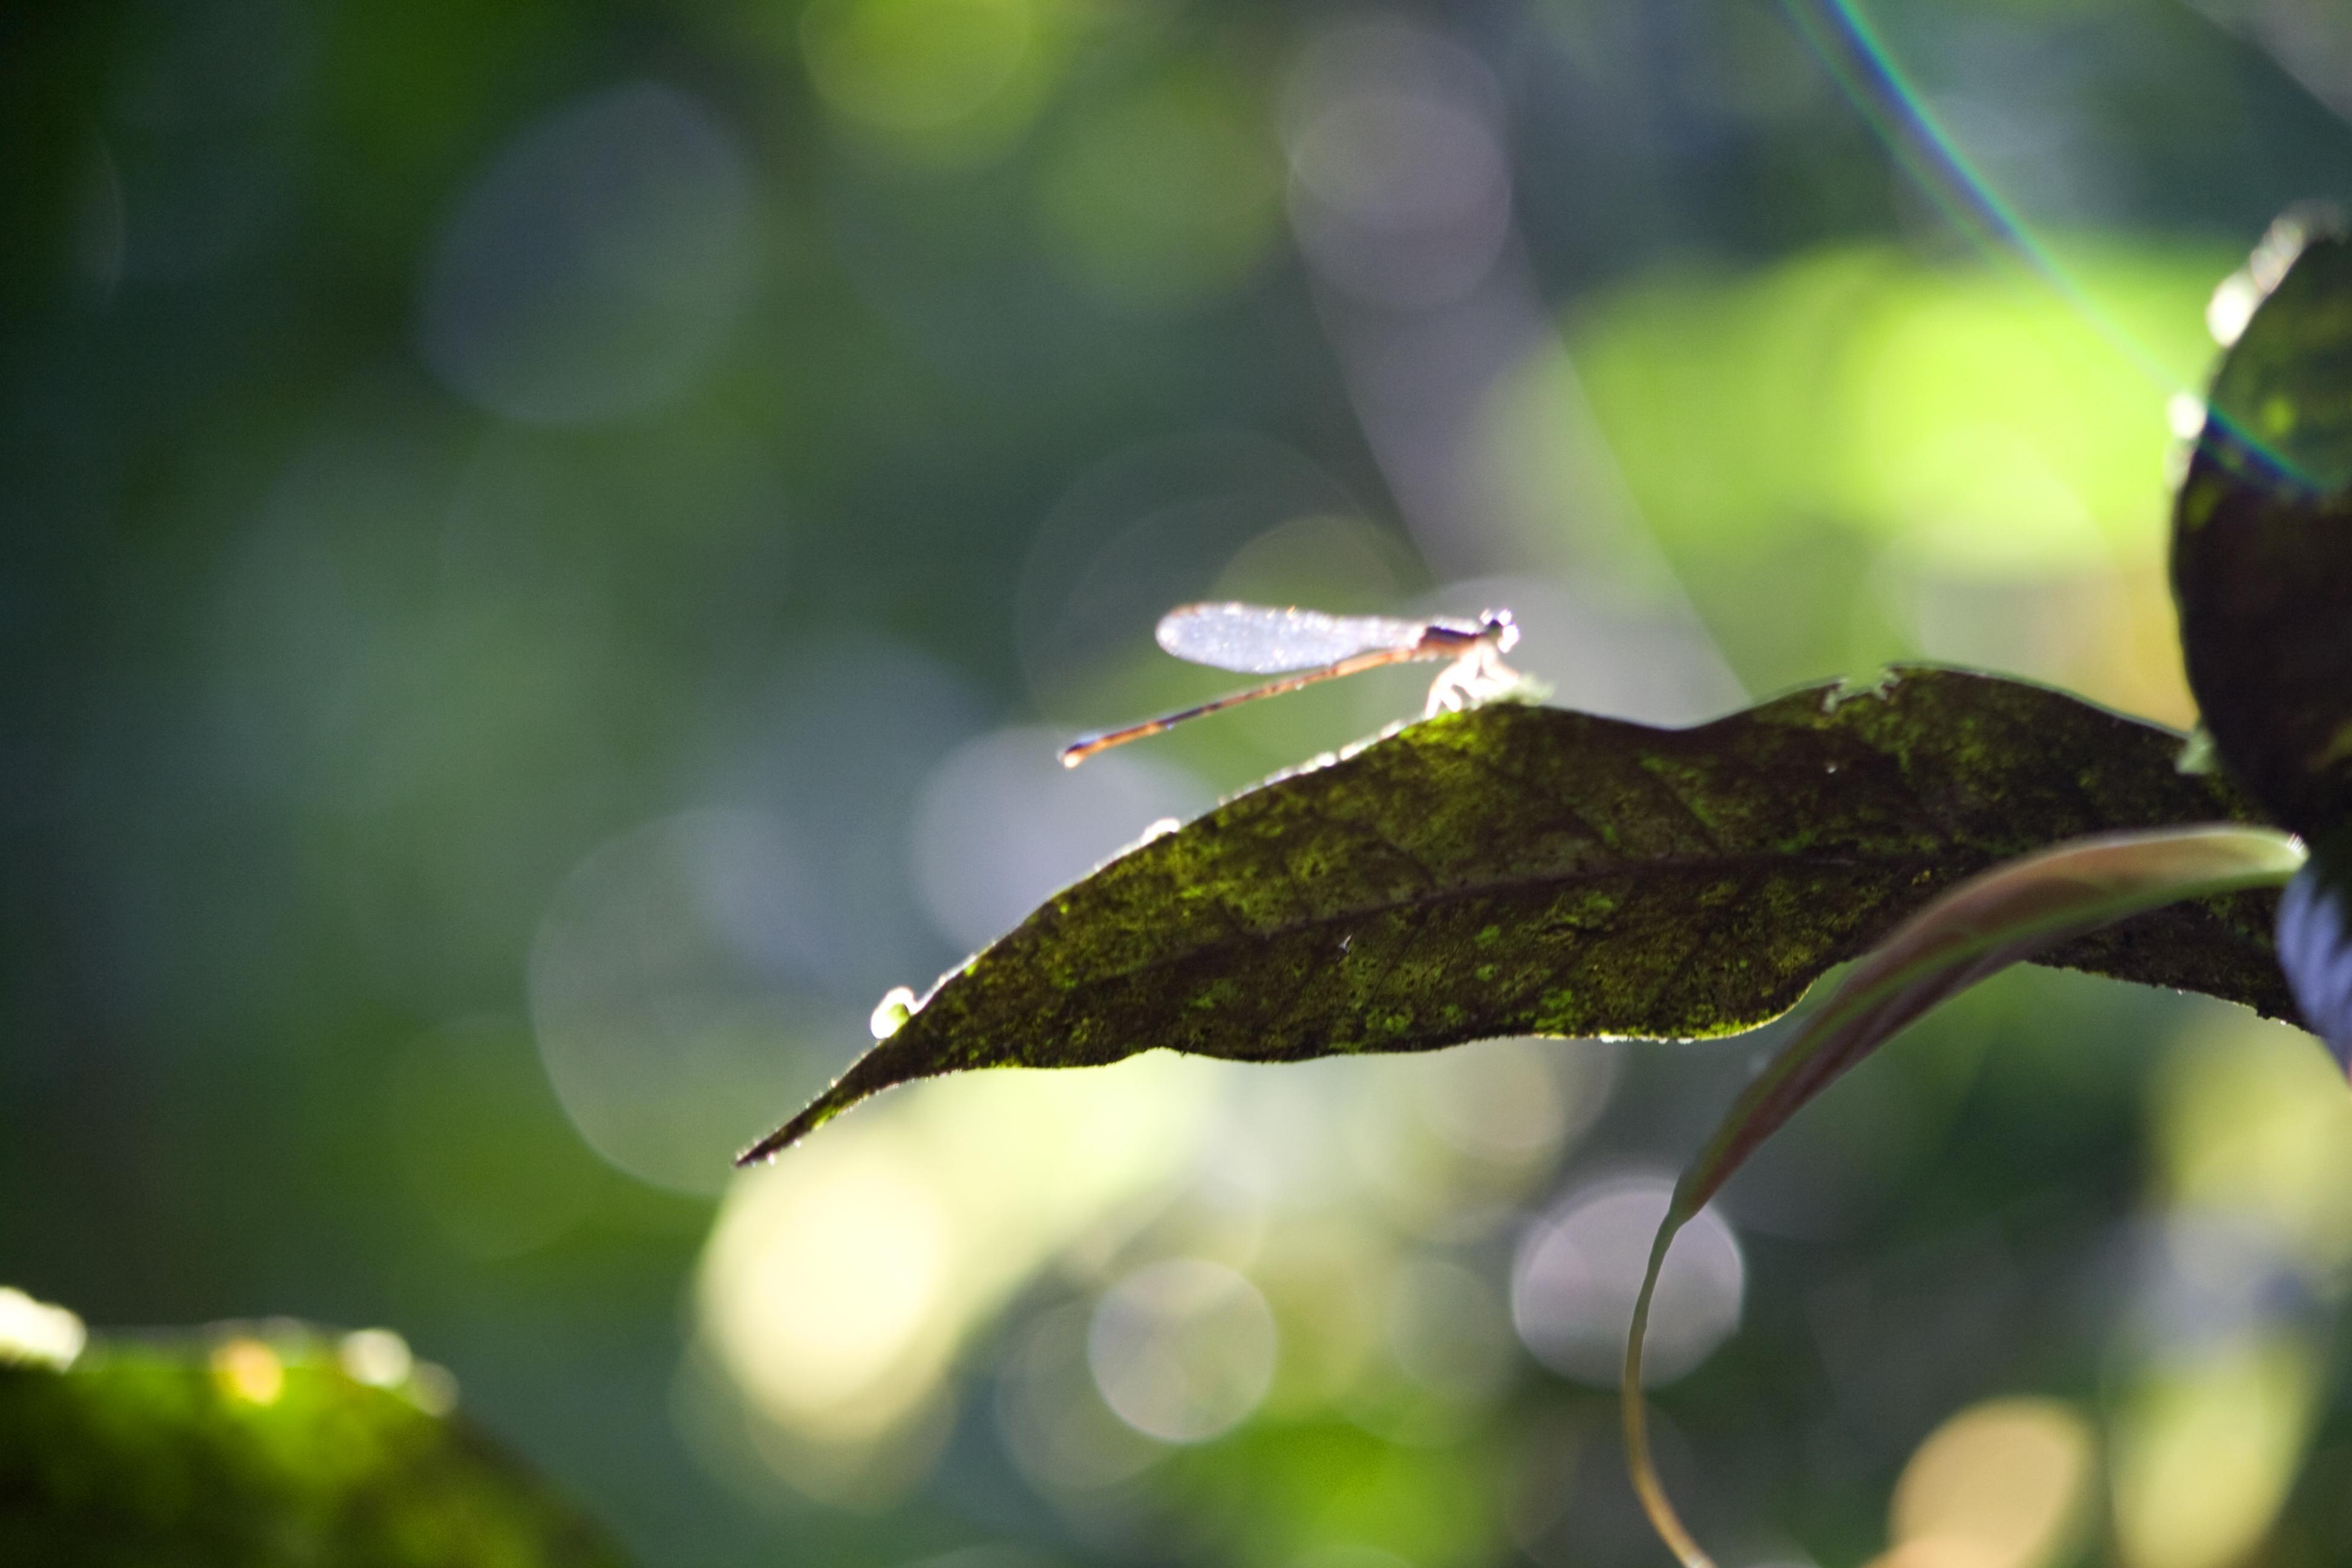 Leaf with dragonfly